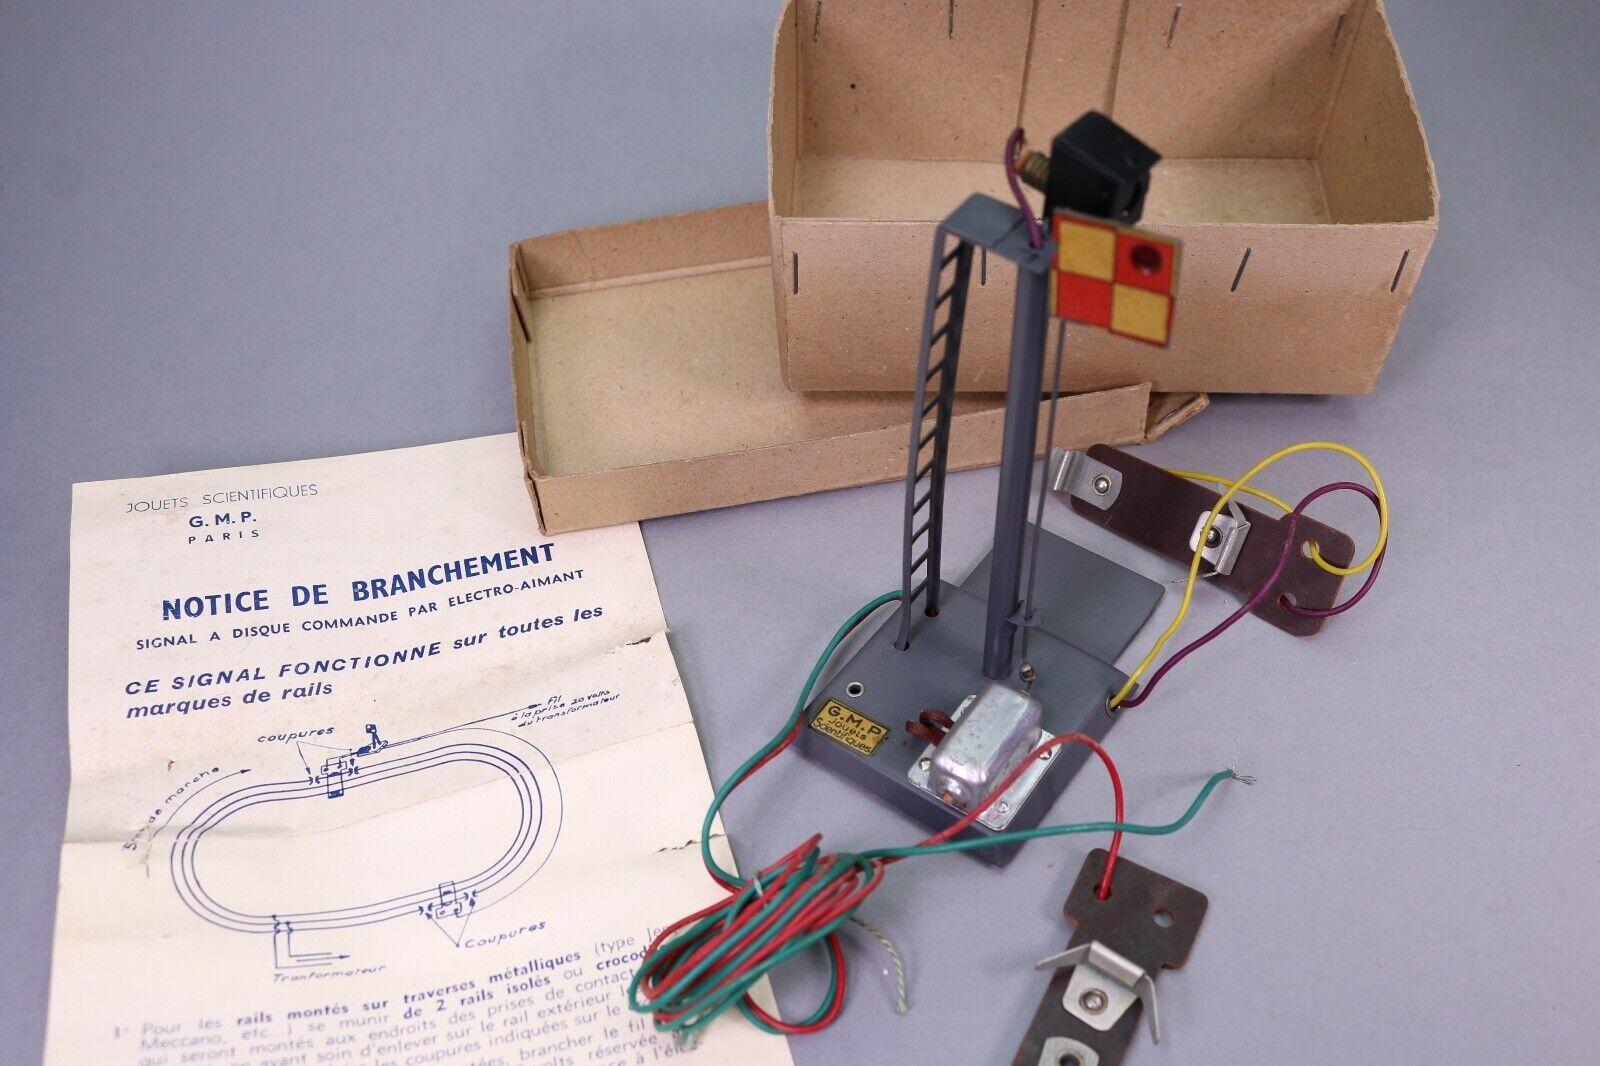 ZA357 GMP Train rail O Signal a disque comuomode par electro aiuomot